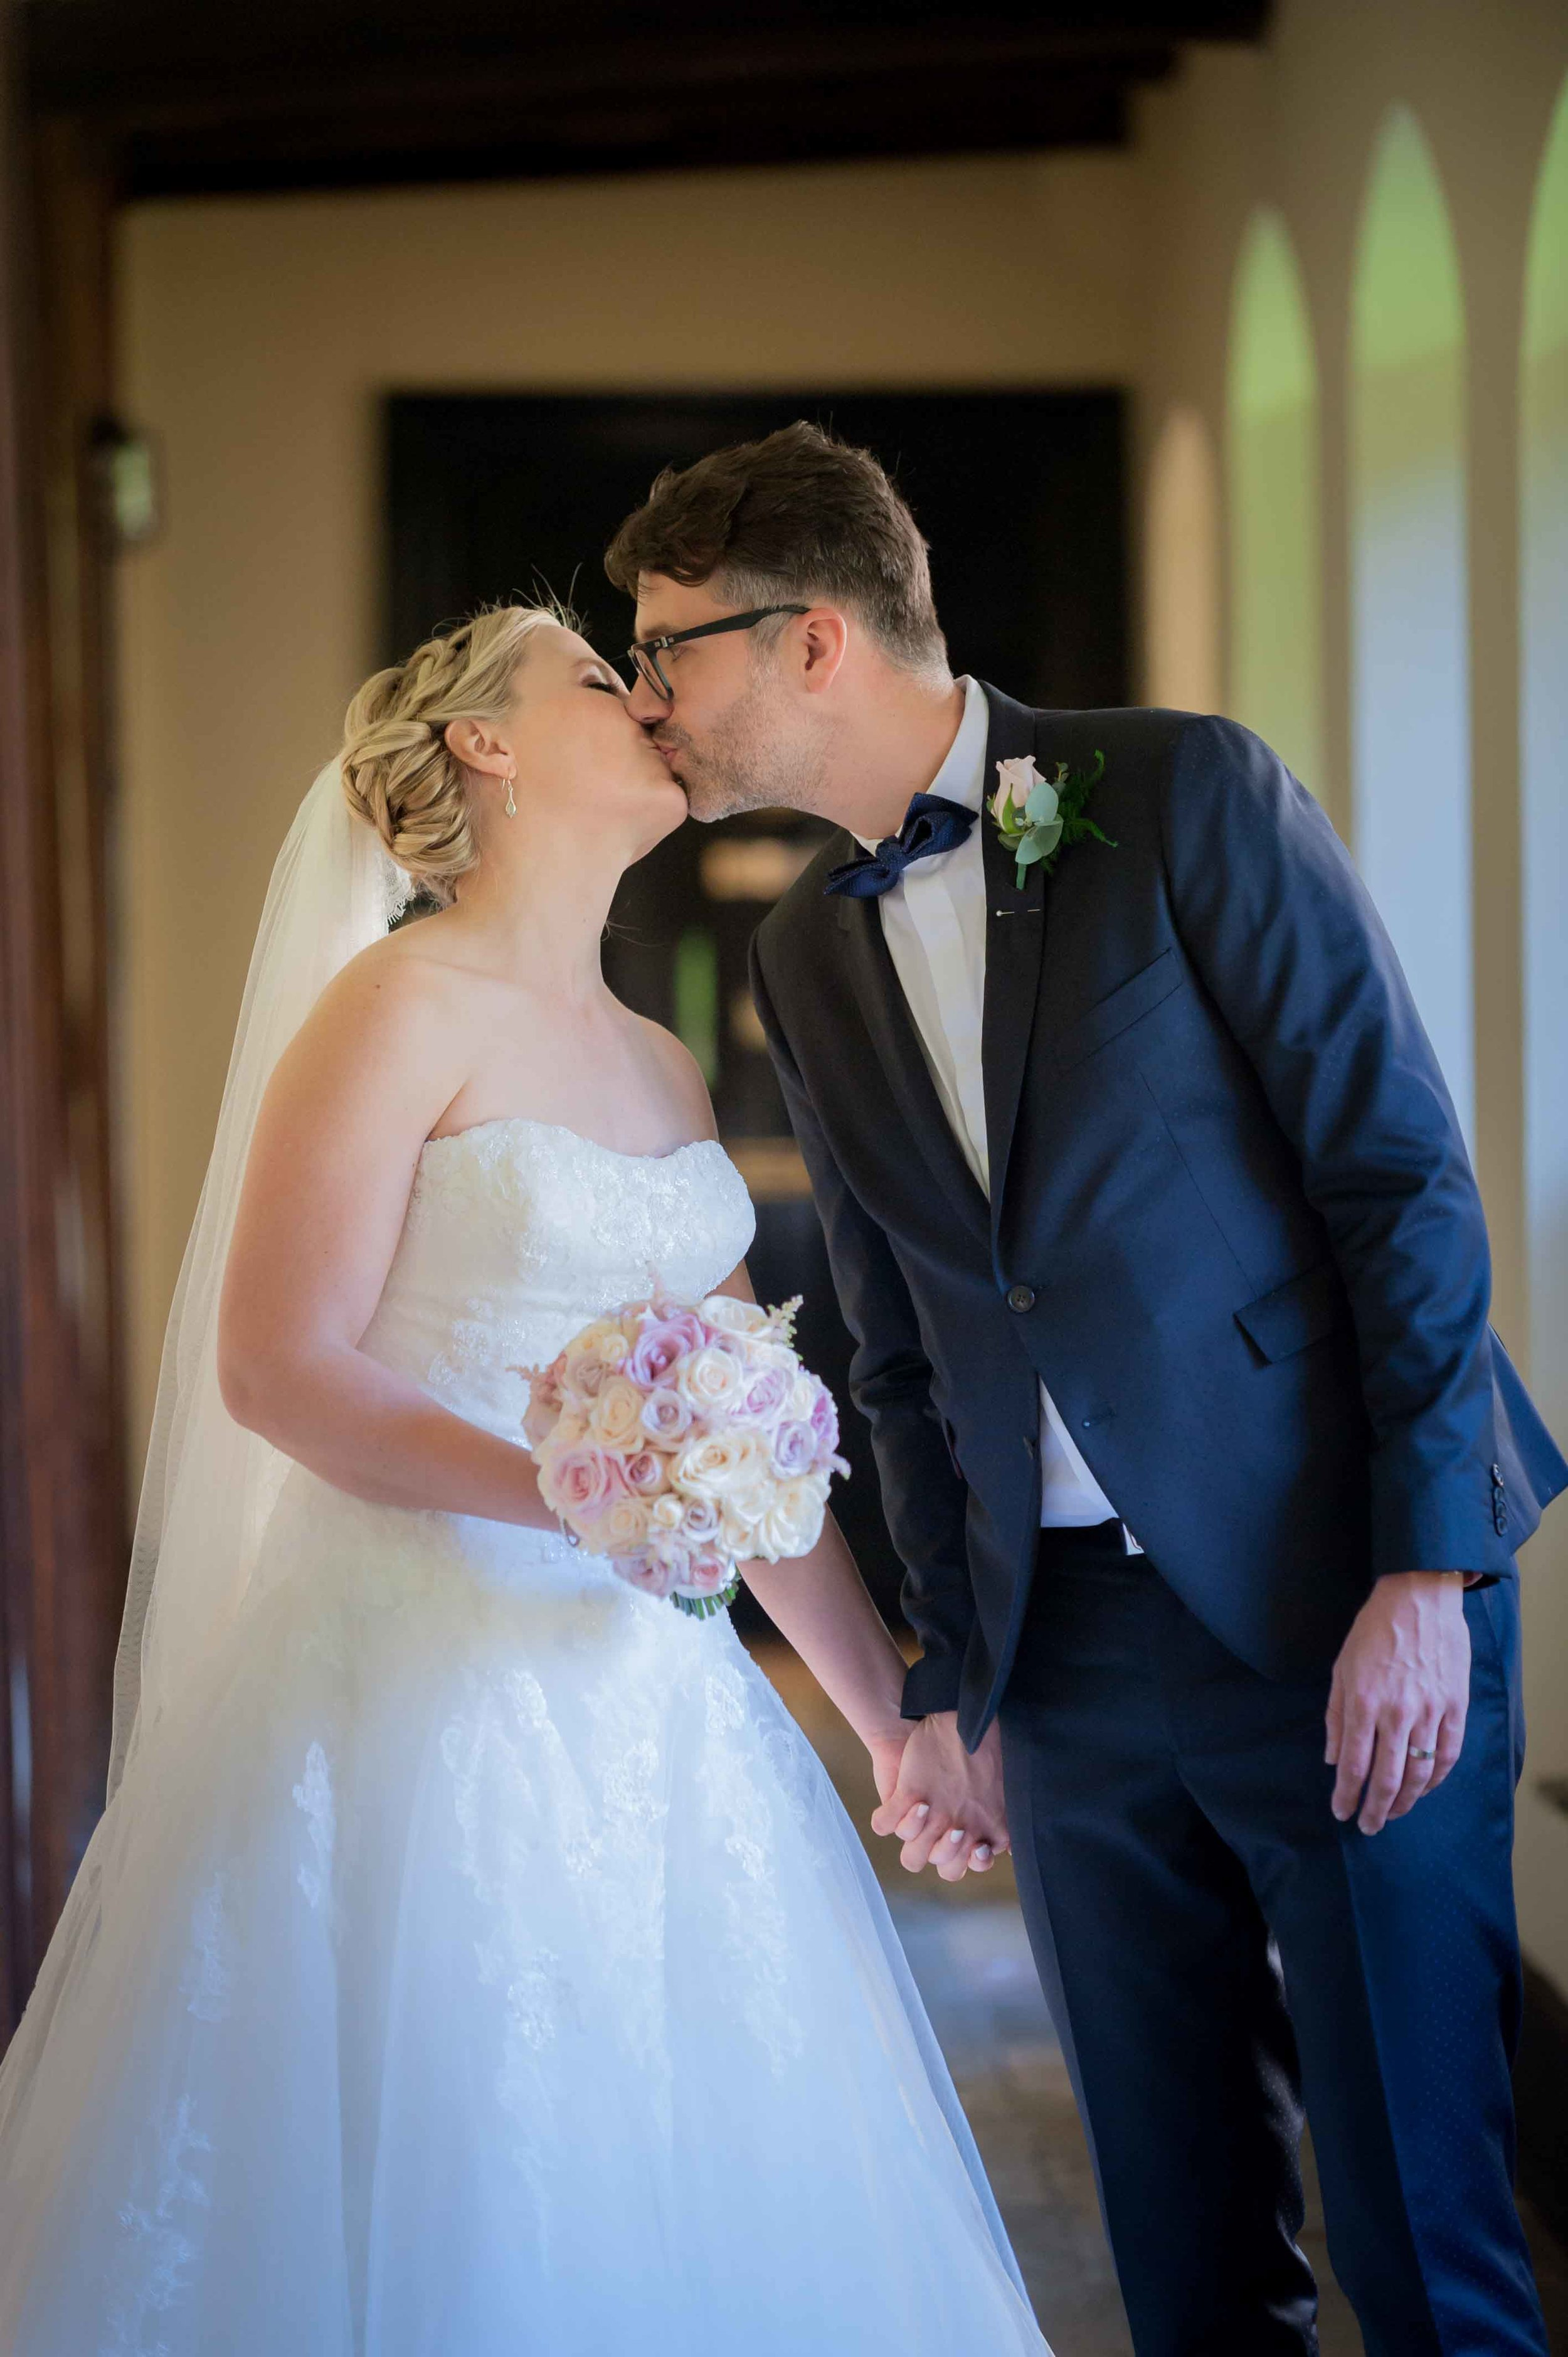 Adrian_Nicole_Charnwood_Weddings_Queens_College_Cambridge-1036.jpg